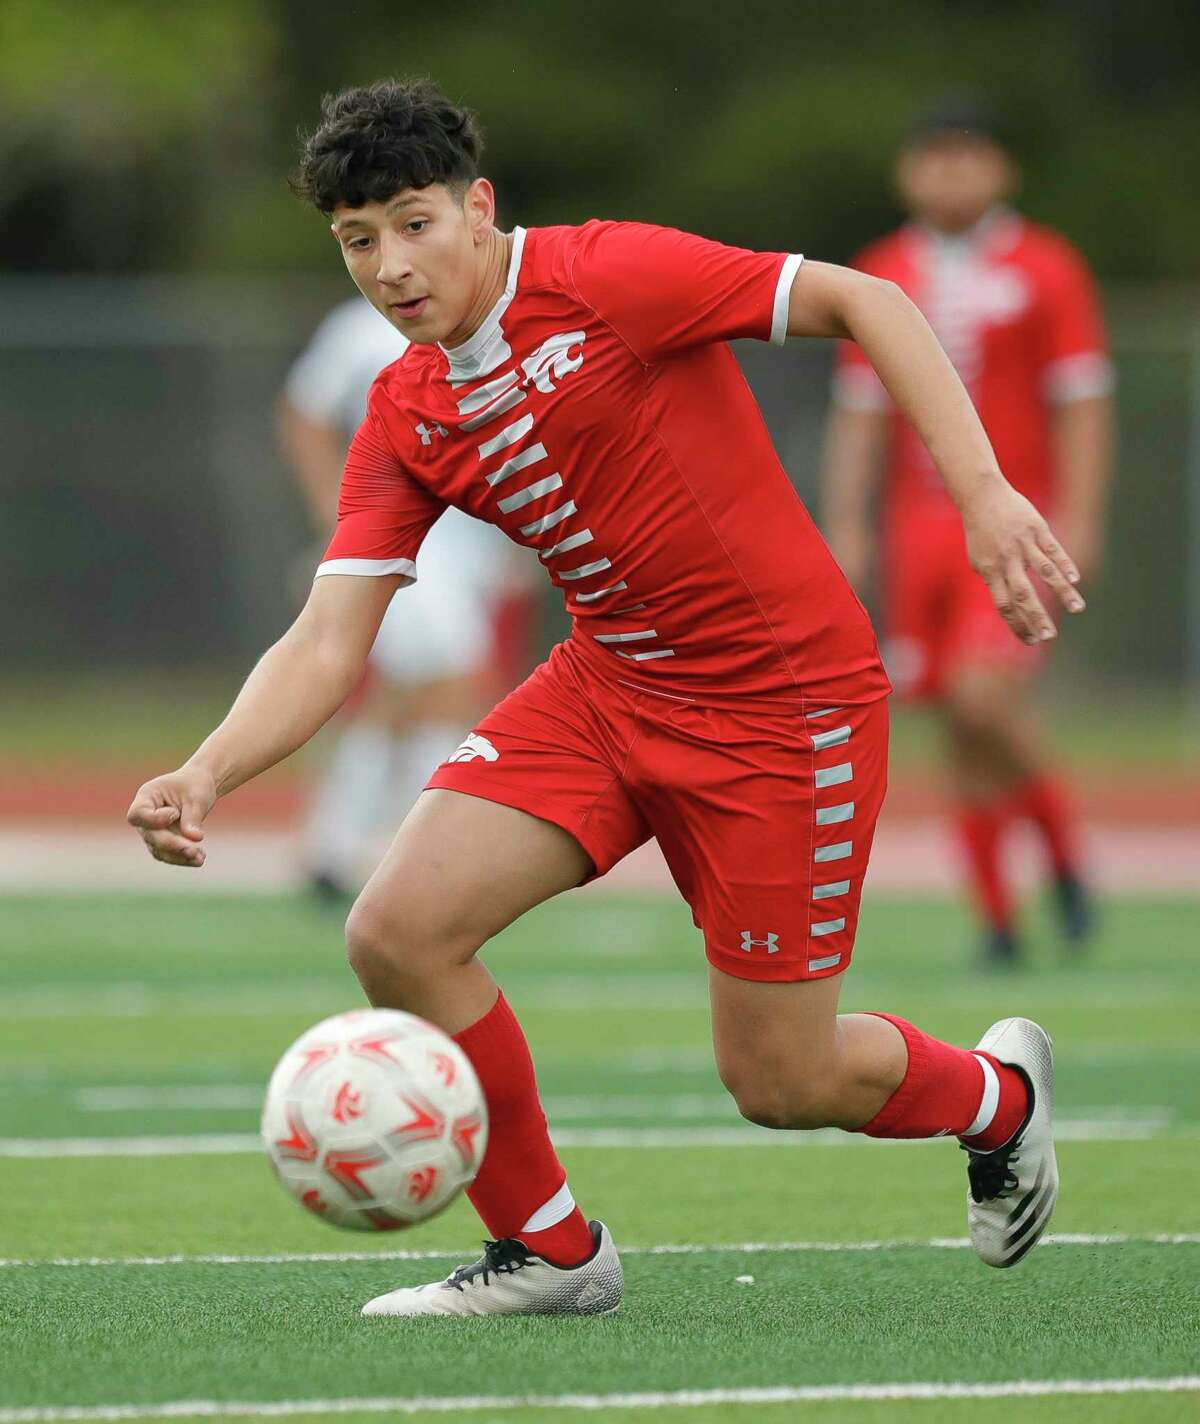 Splendora's Martin Barajas (7) looks to control the ball during the first period of a Region III-4A quarterfinal high school soccer match at Wildcat Stadium, Saturday, April 3, 2021, in Splendora.